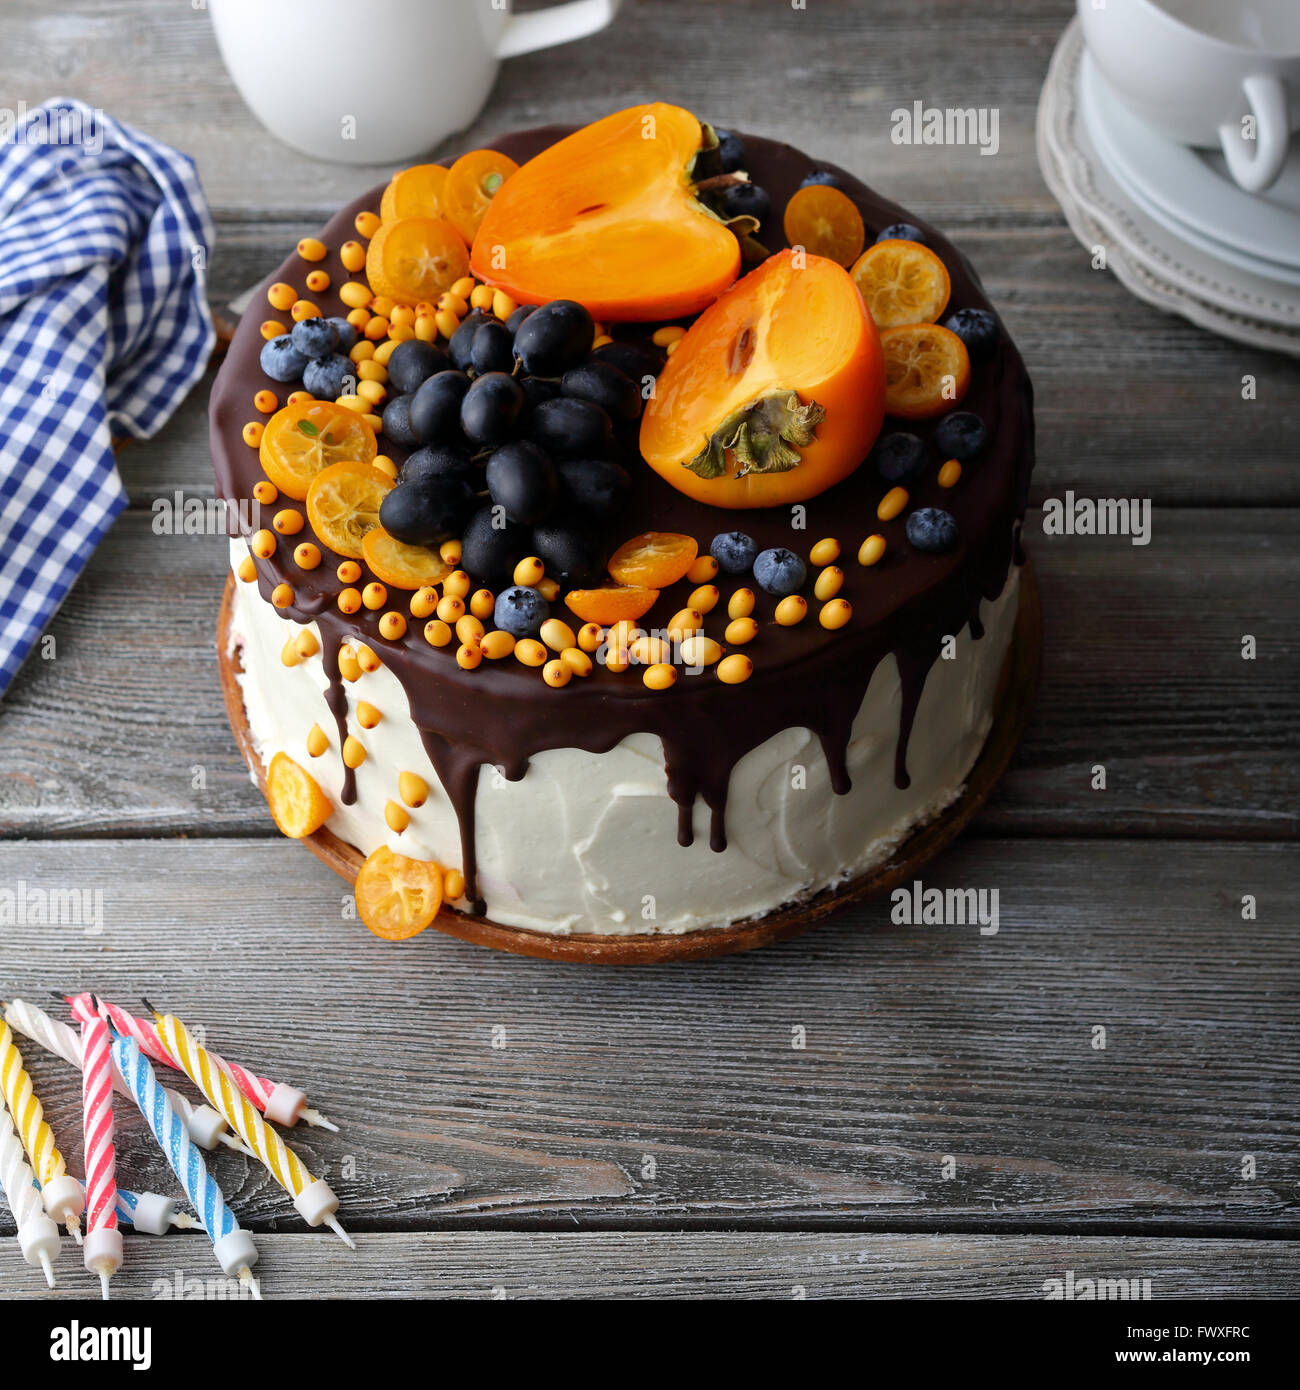 fruit cake on rustic boards, food closeup - Stock Image